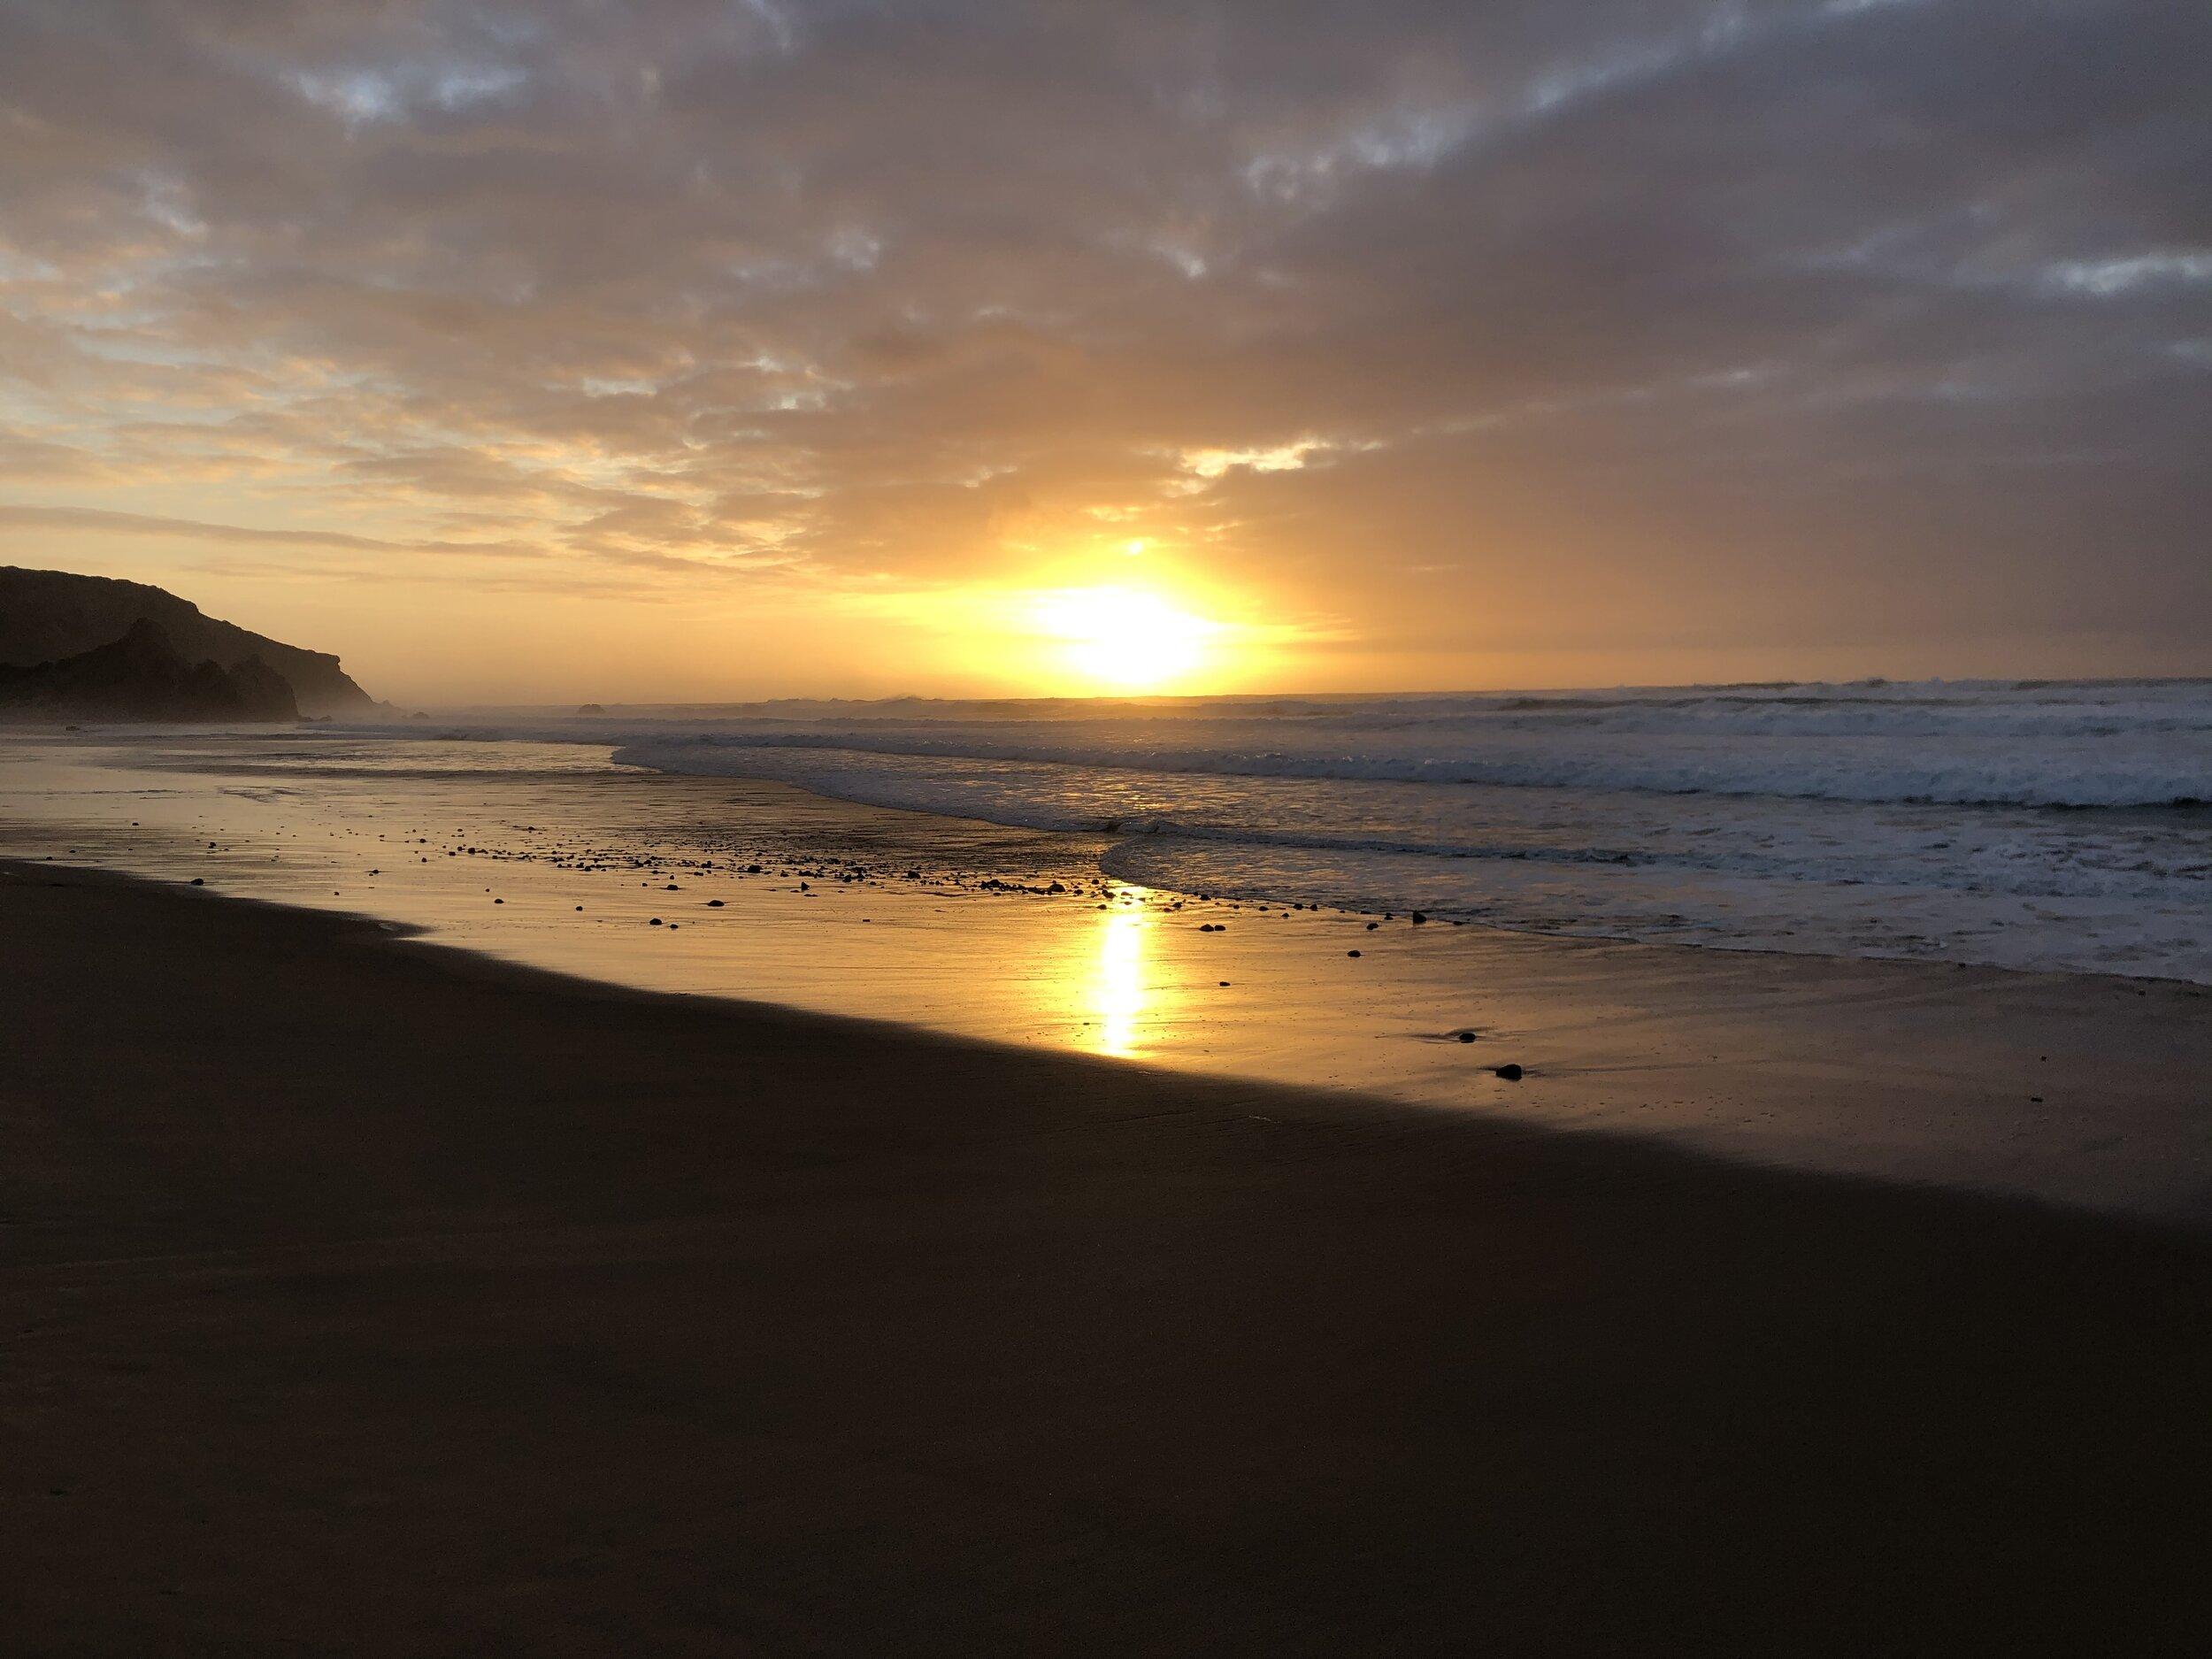 Playa Amado